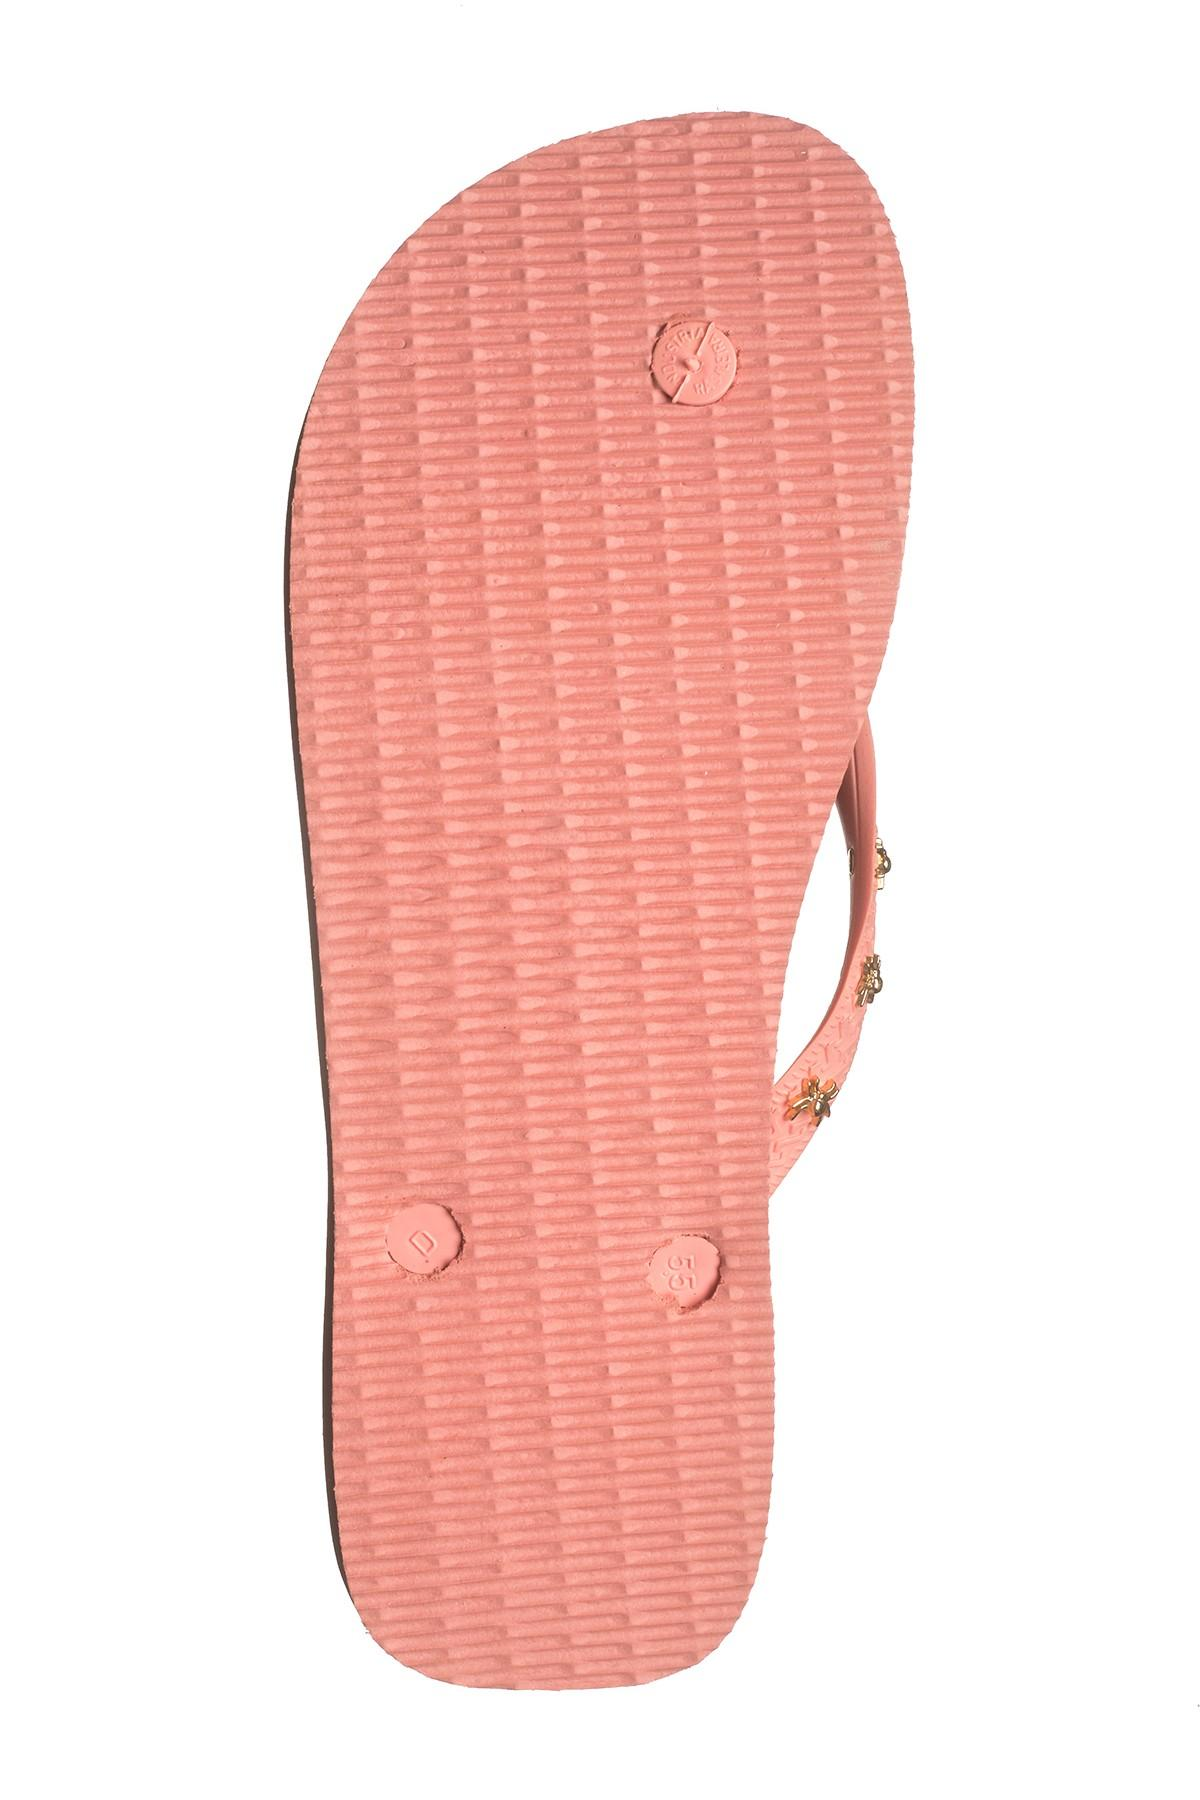 5f8e51297122 Havaianas - Pink Charlotte Olympia Sandal - Lyst. View fullscreen